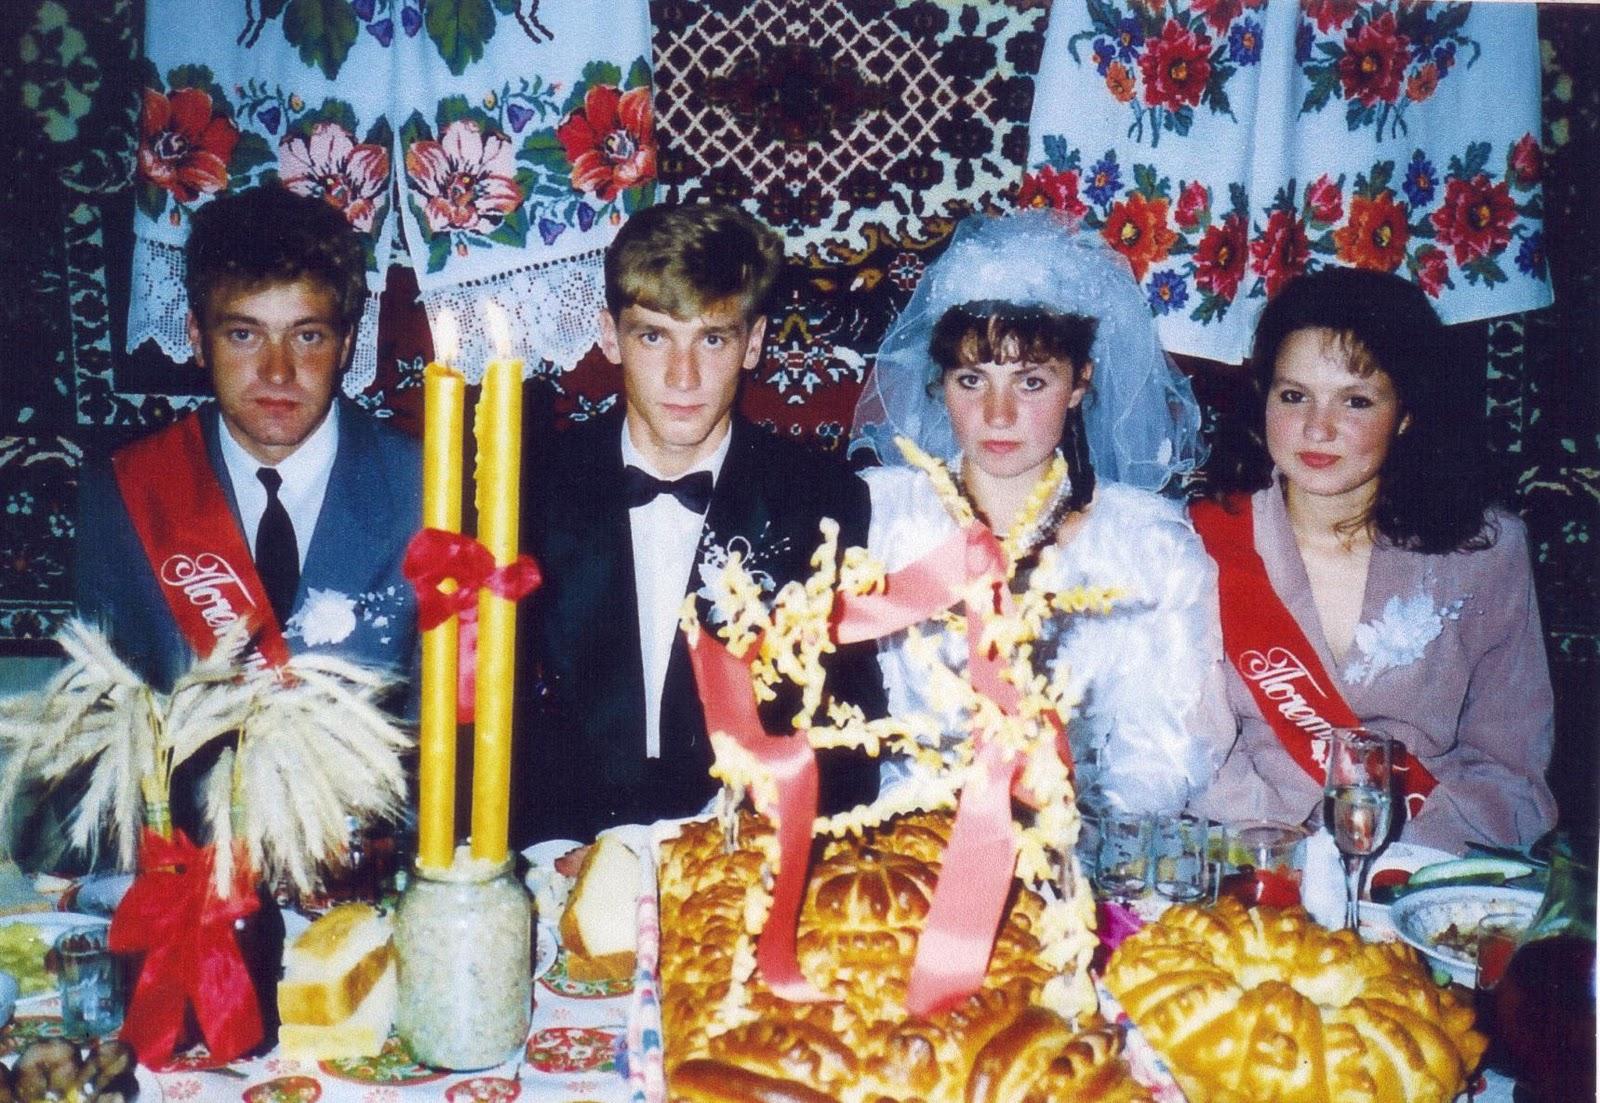 Українське Весілля  Весілля села Велика Павлівка (Зіньківський р-н ... 7603e5e4741d7